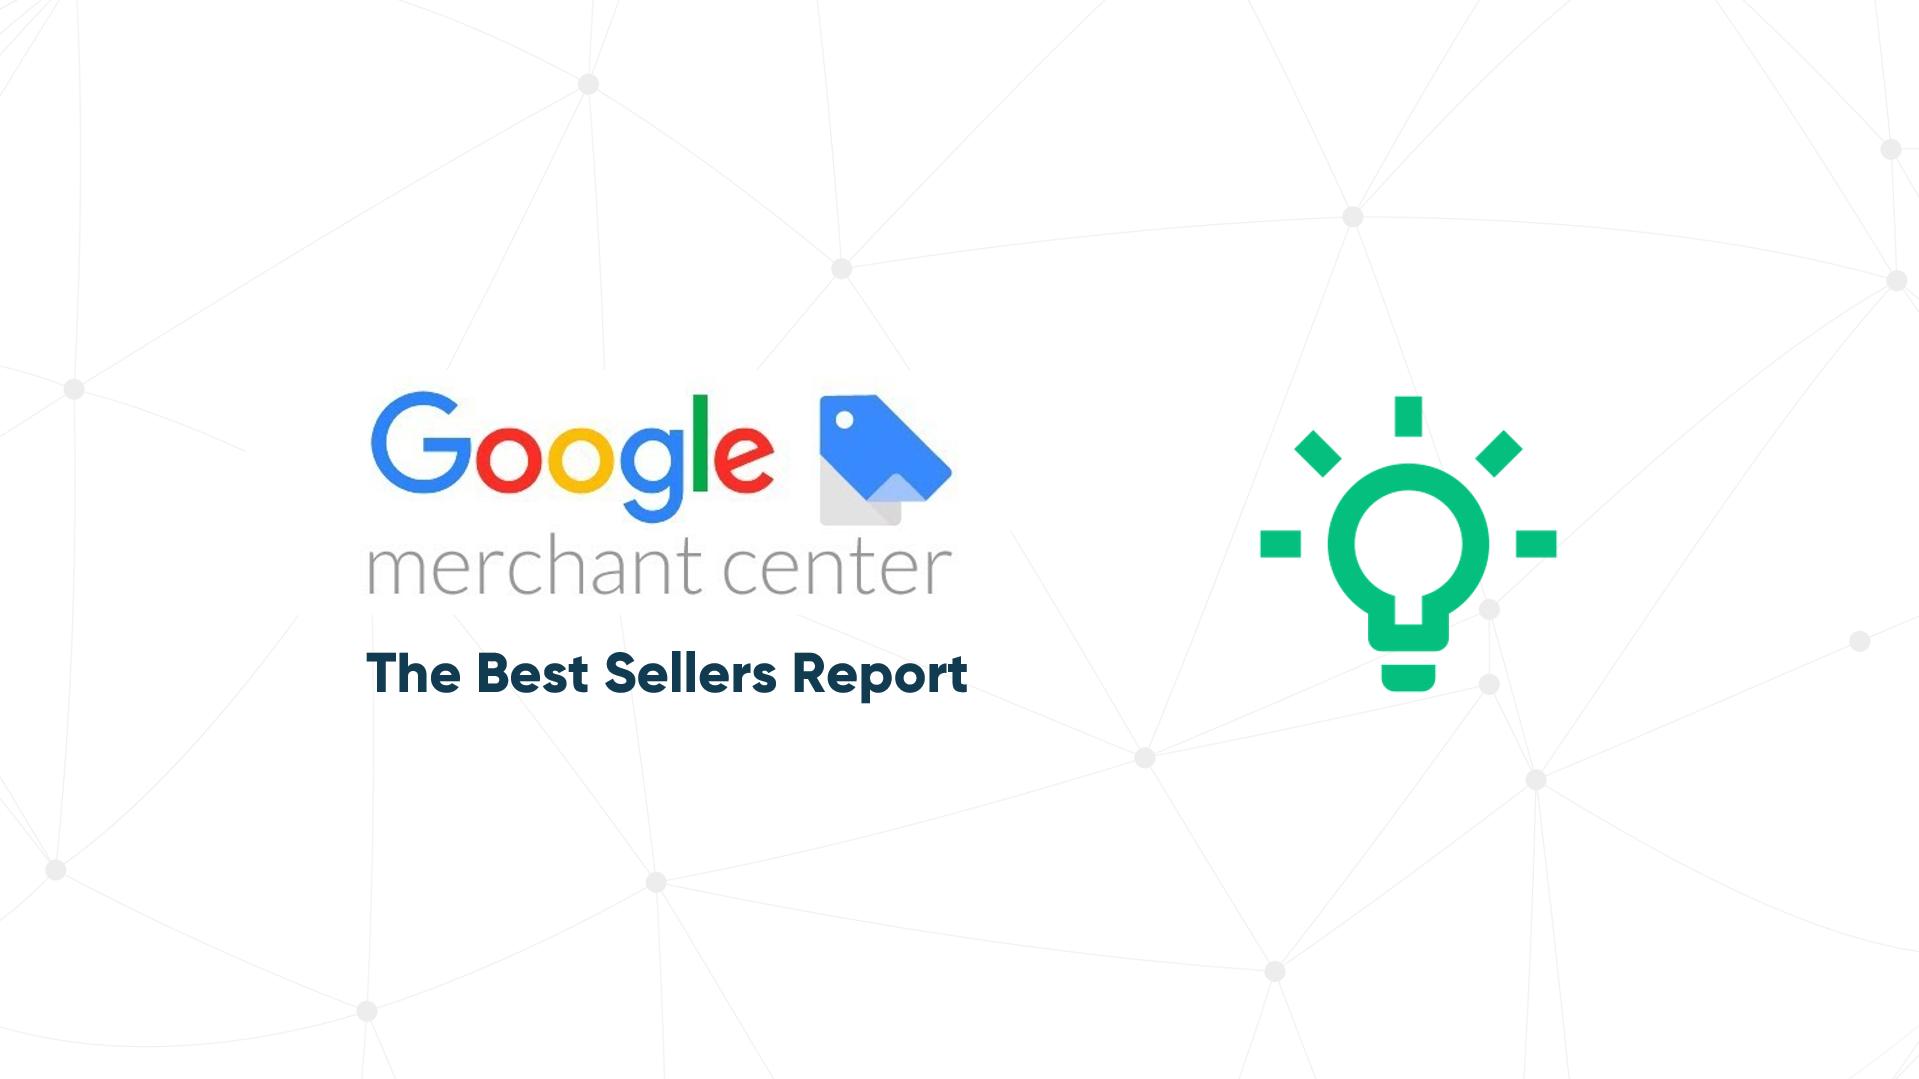 What is Google Merchant Center